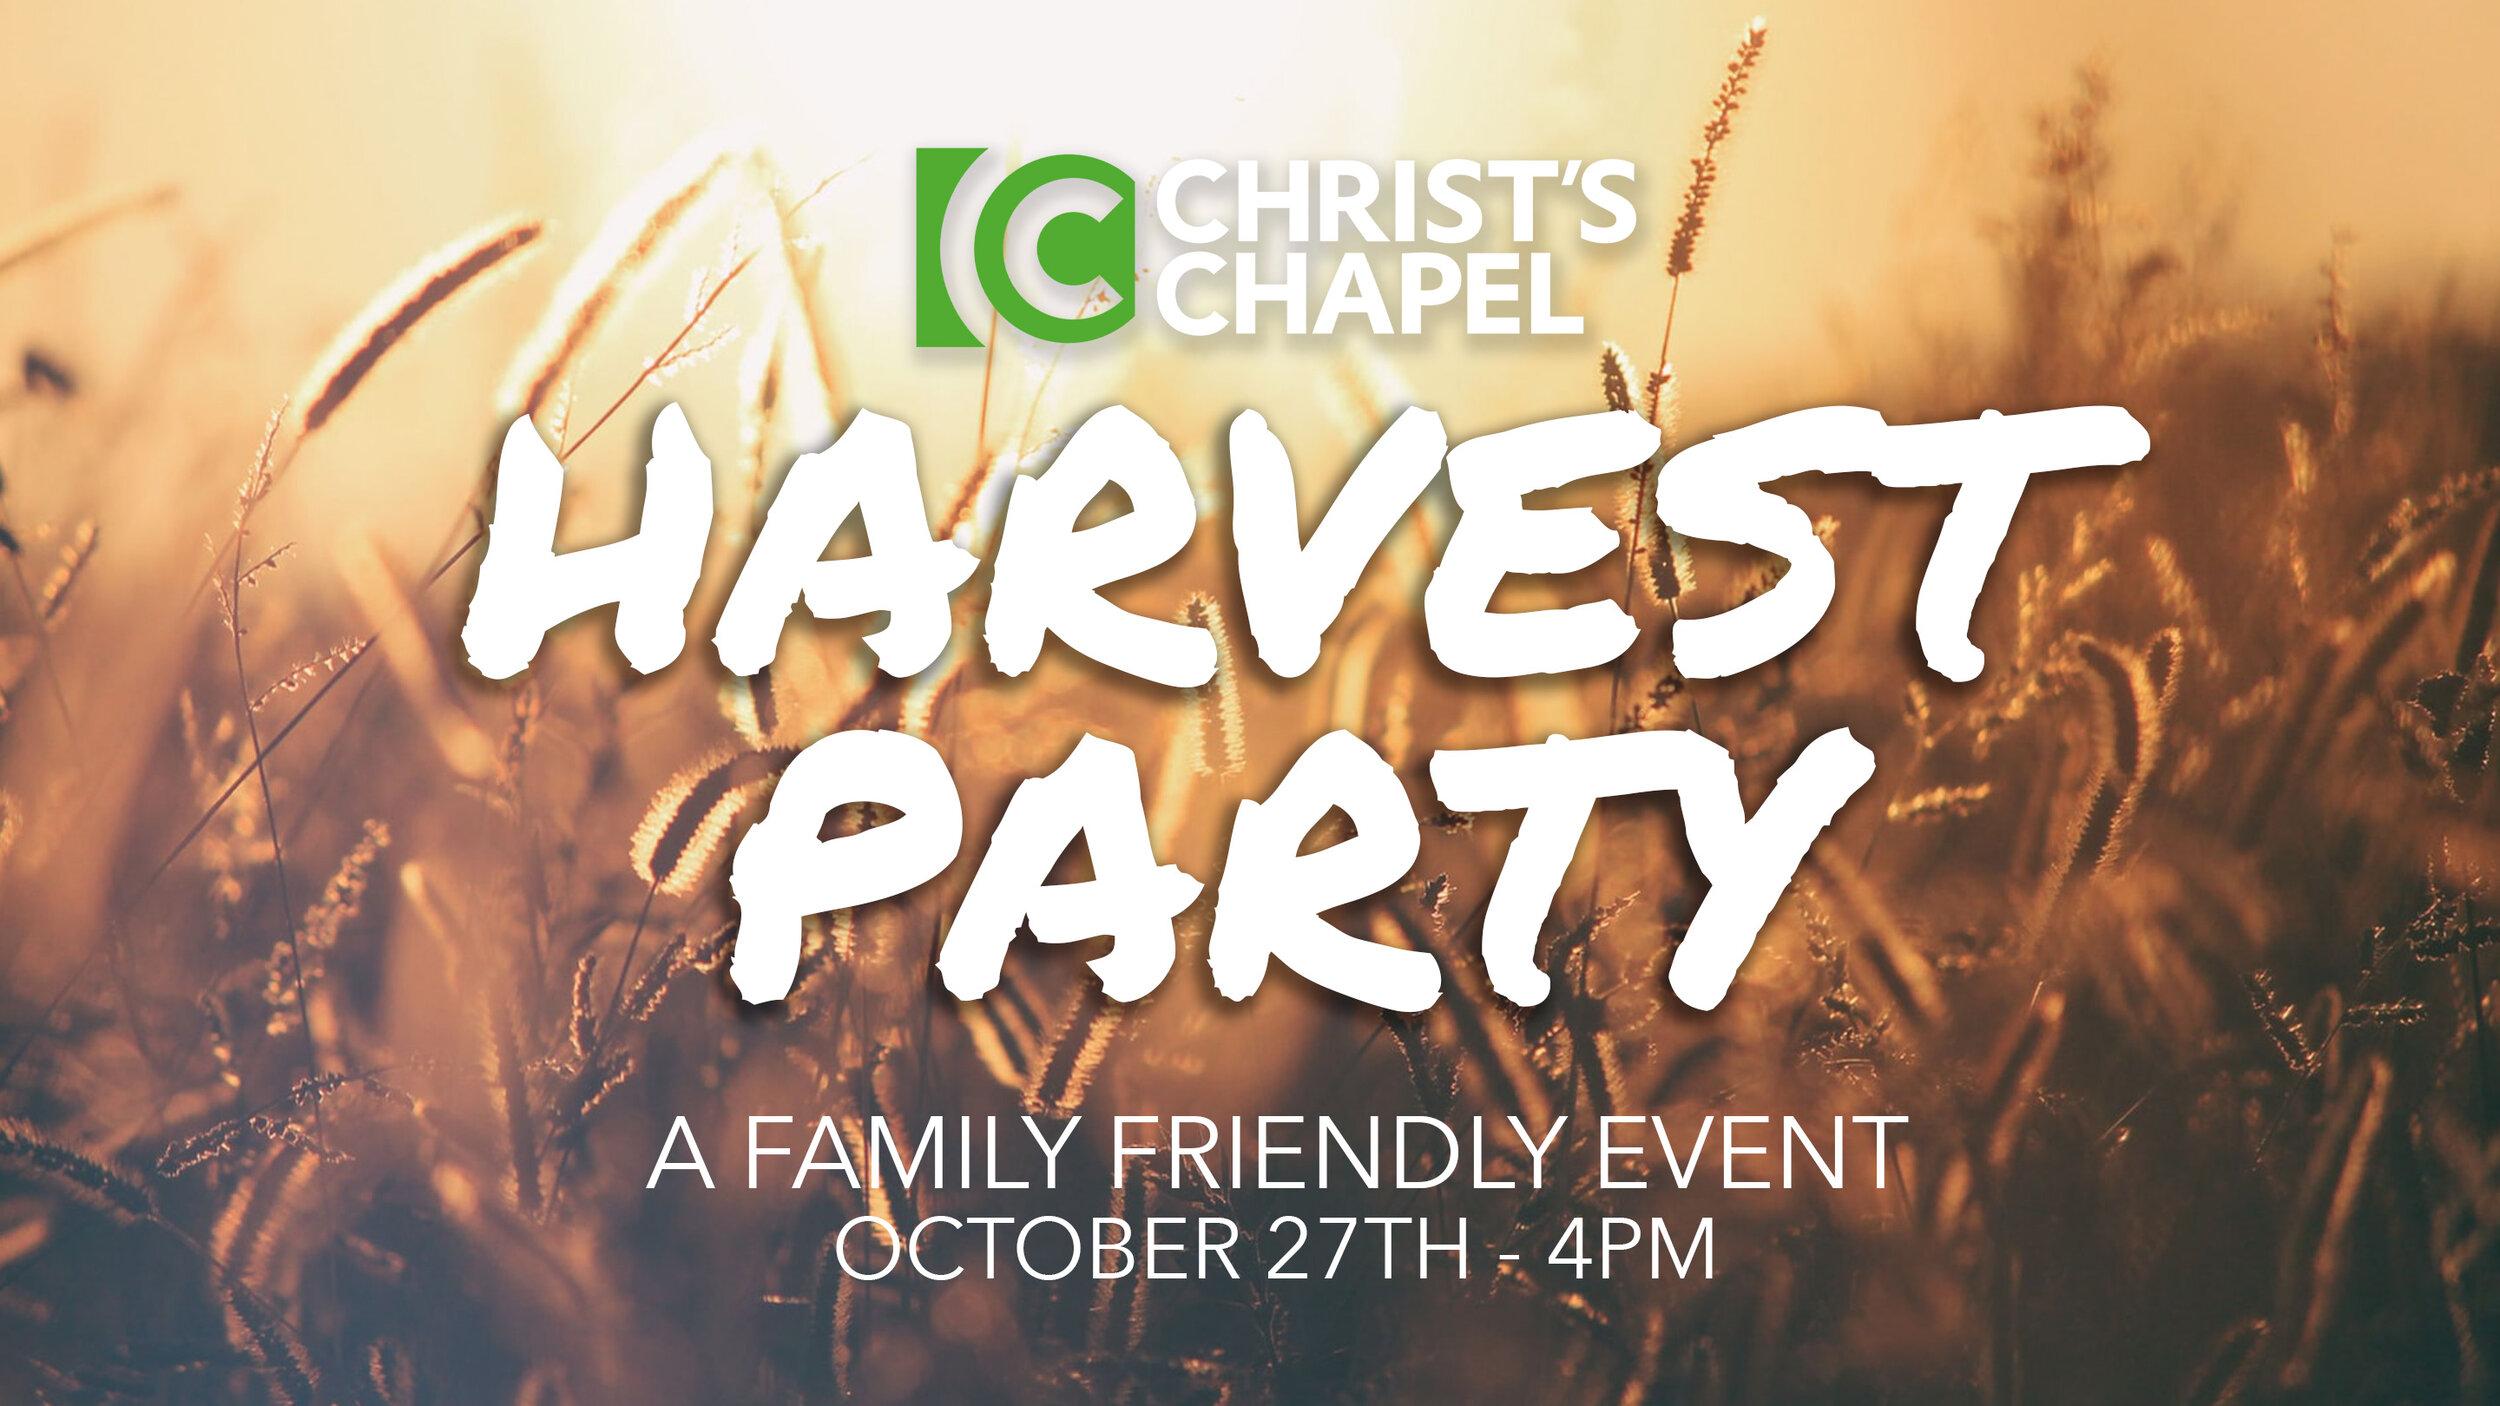 HarvestParty_EventGraphic.jpg